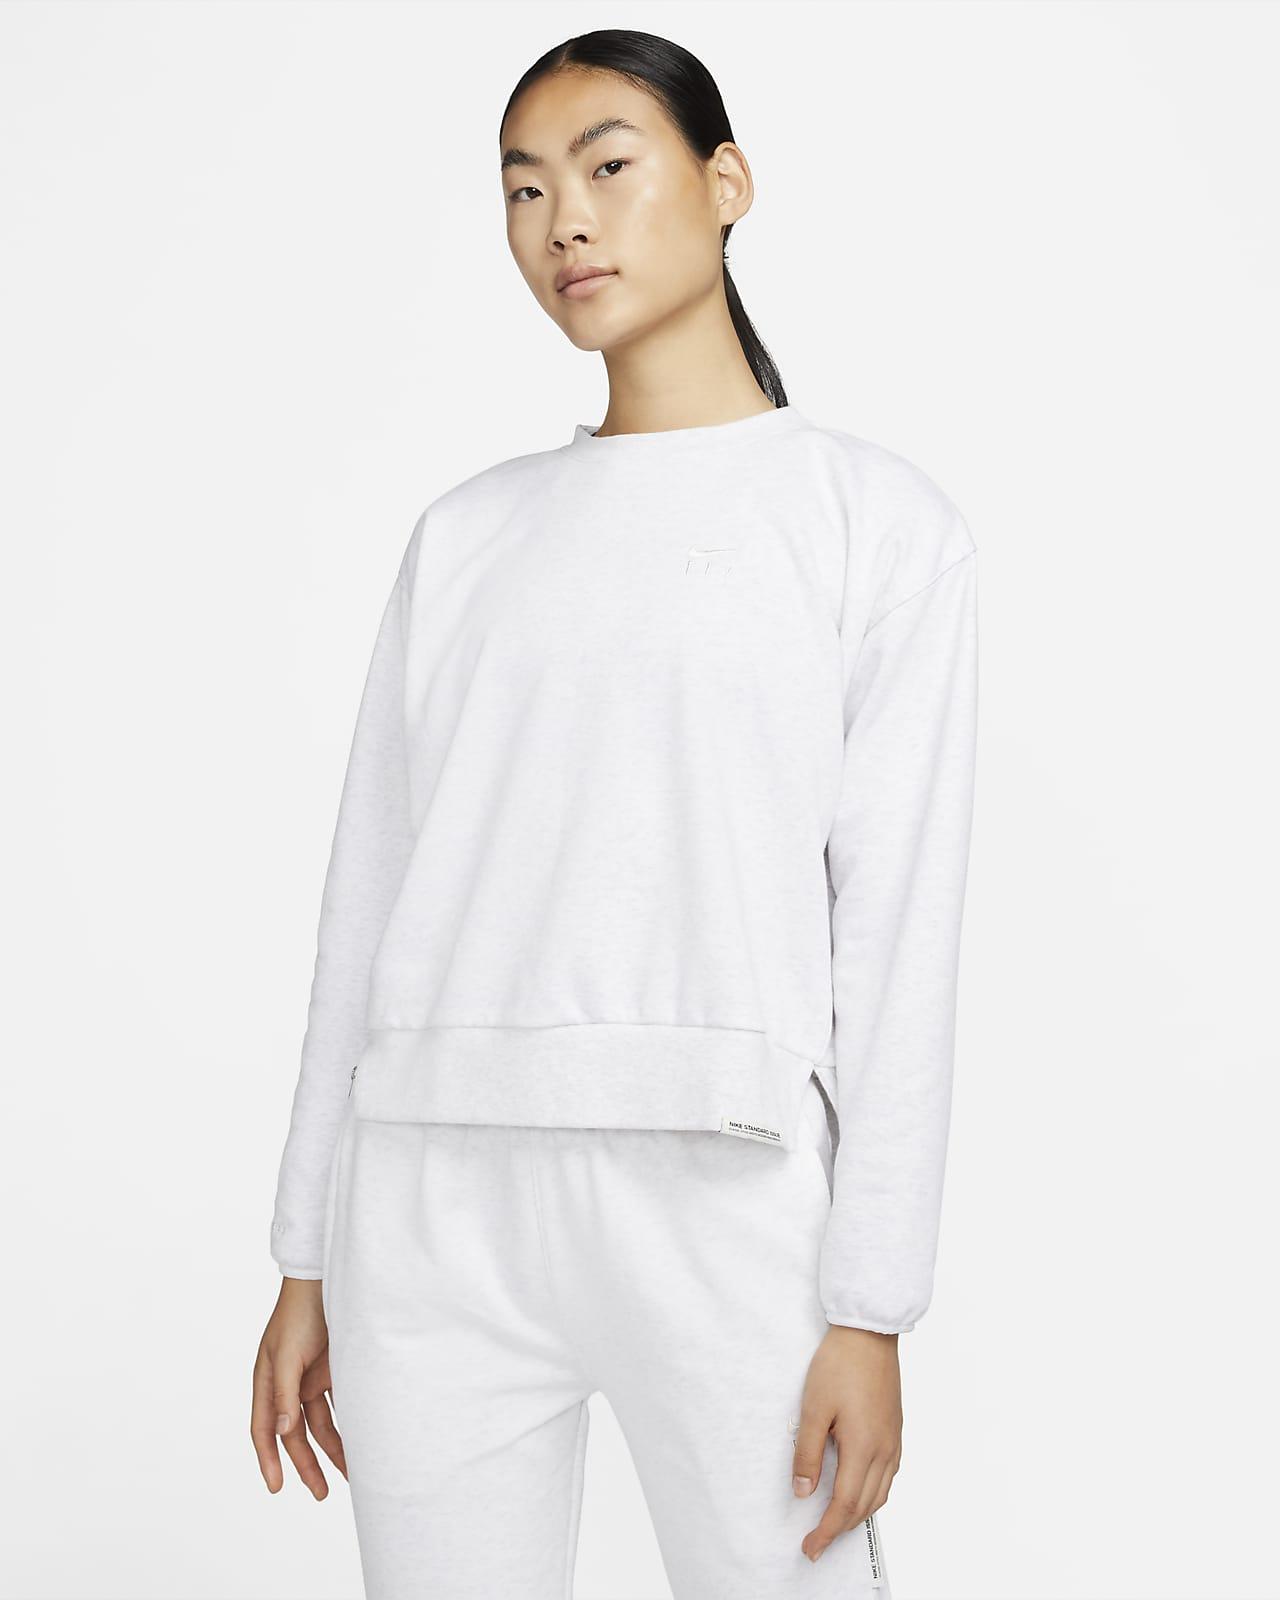 Nike Standard Issue Women's Basketball Crew Sweatshirt